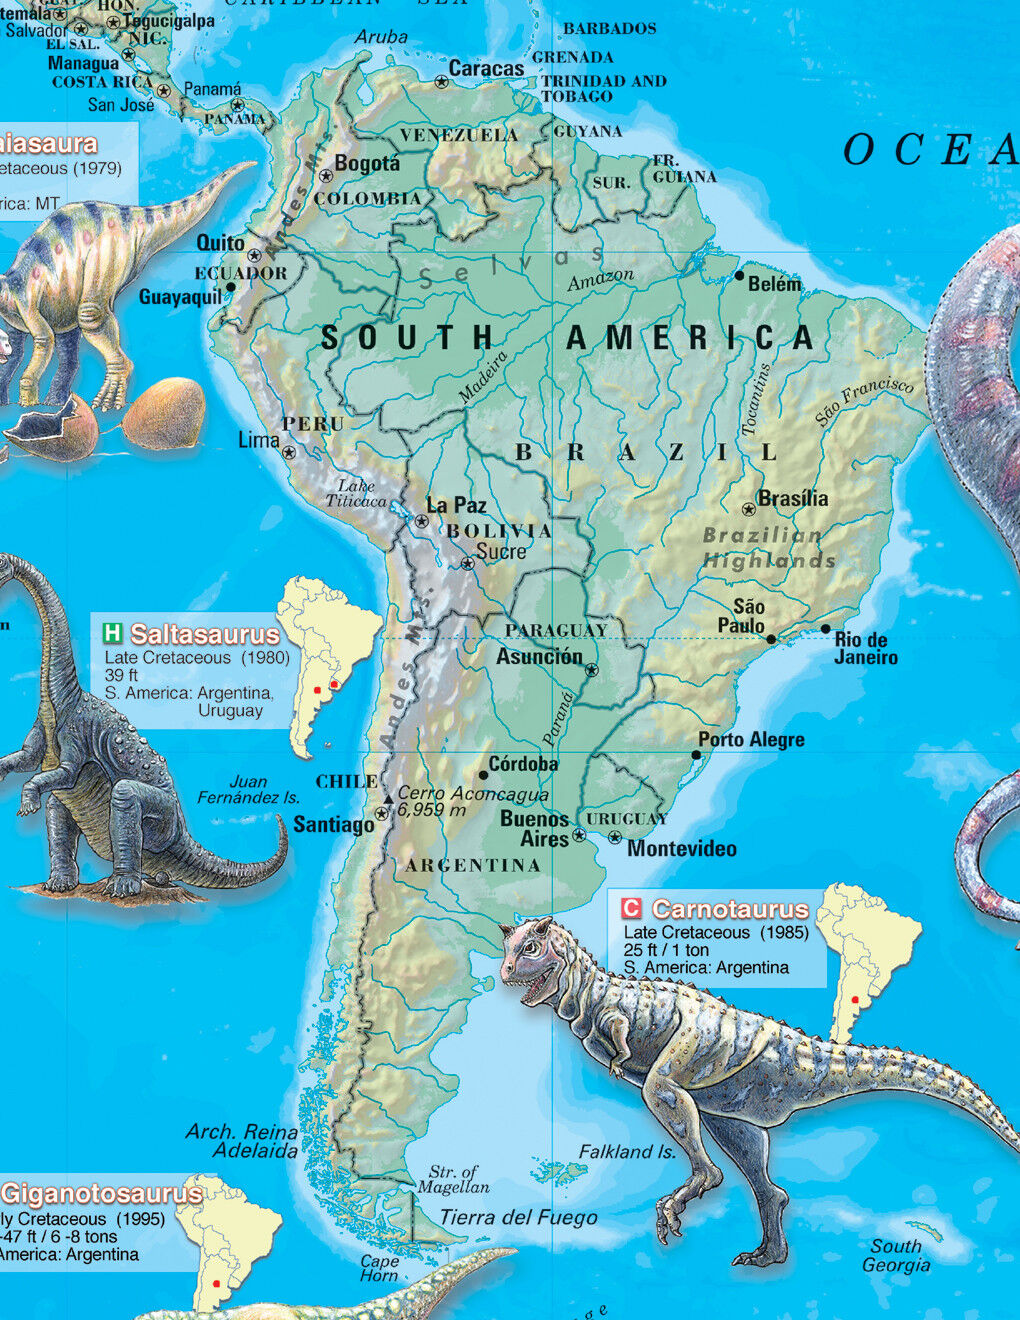 Cool Owl Maps Dinosaur World Wall Map Poster 36